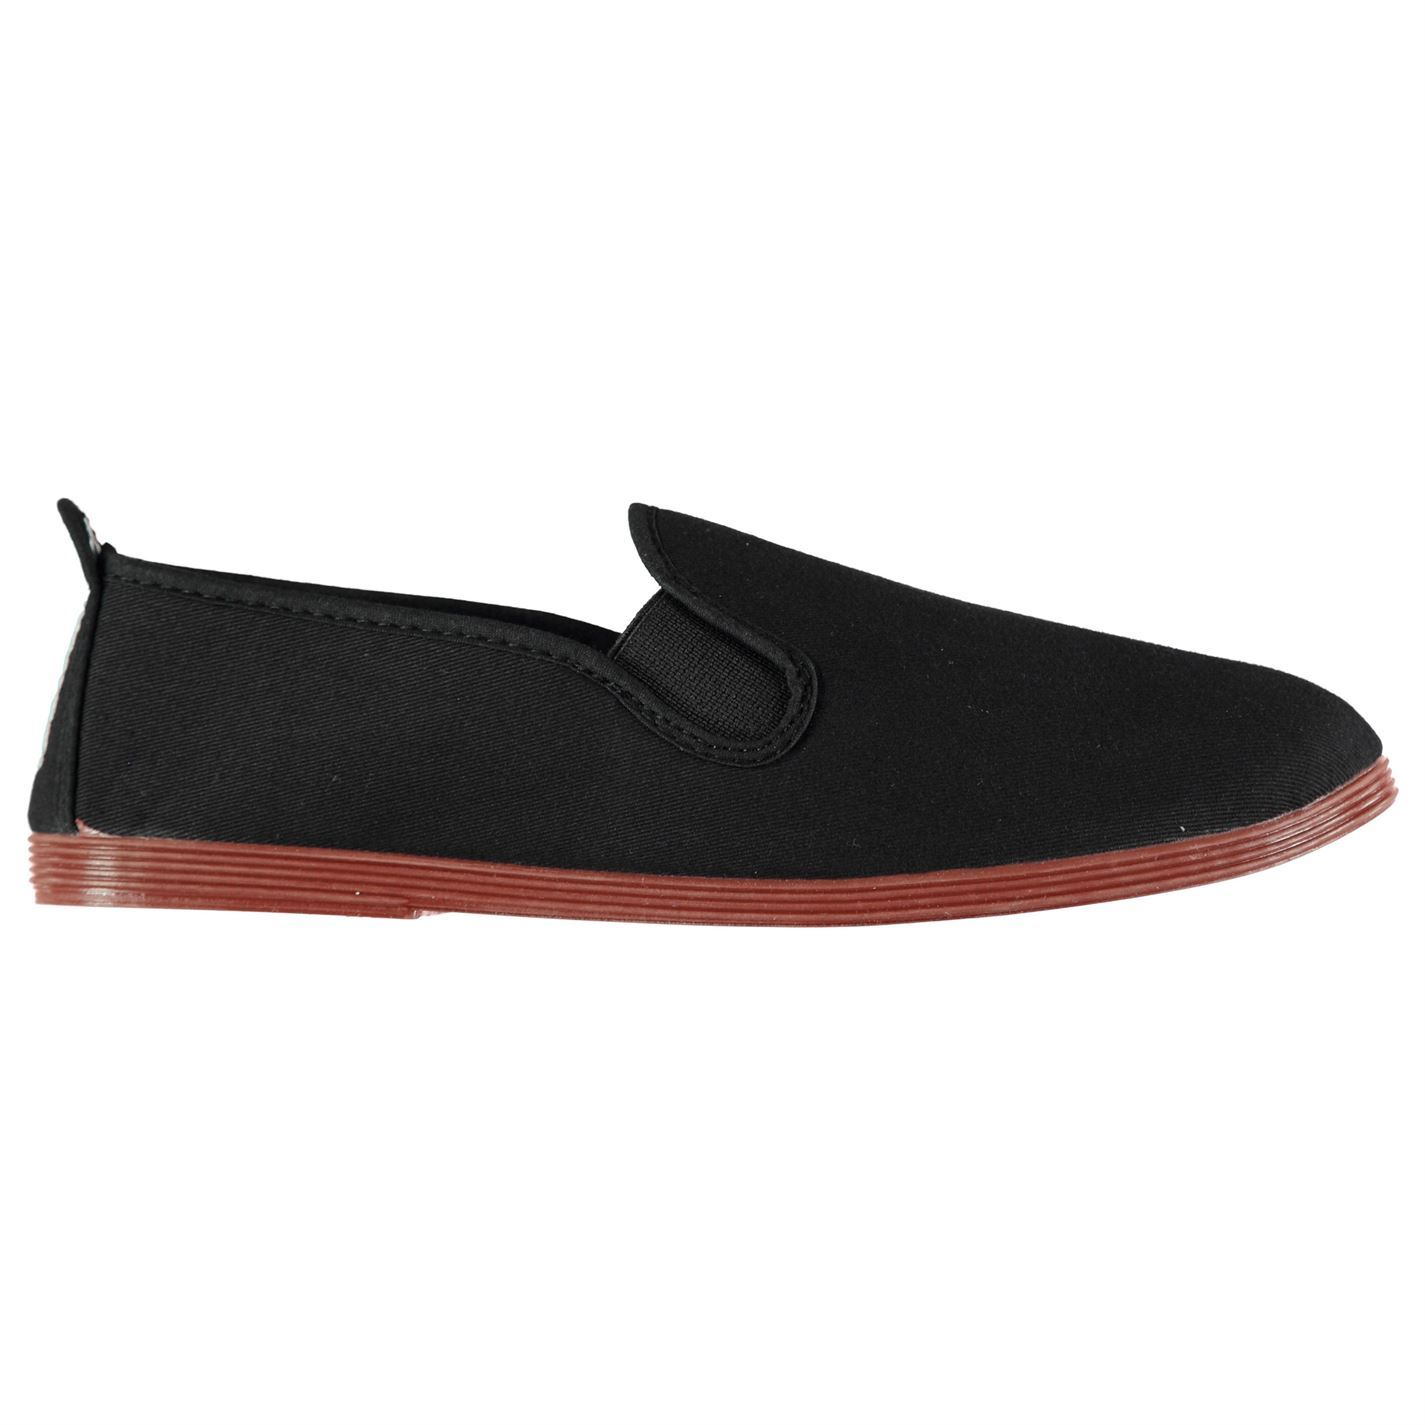 uomo Shoes On da Arendo da ginnastica Flossy Scarpe Slip vaSxqOTO